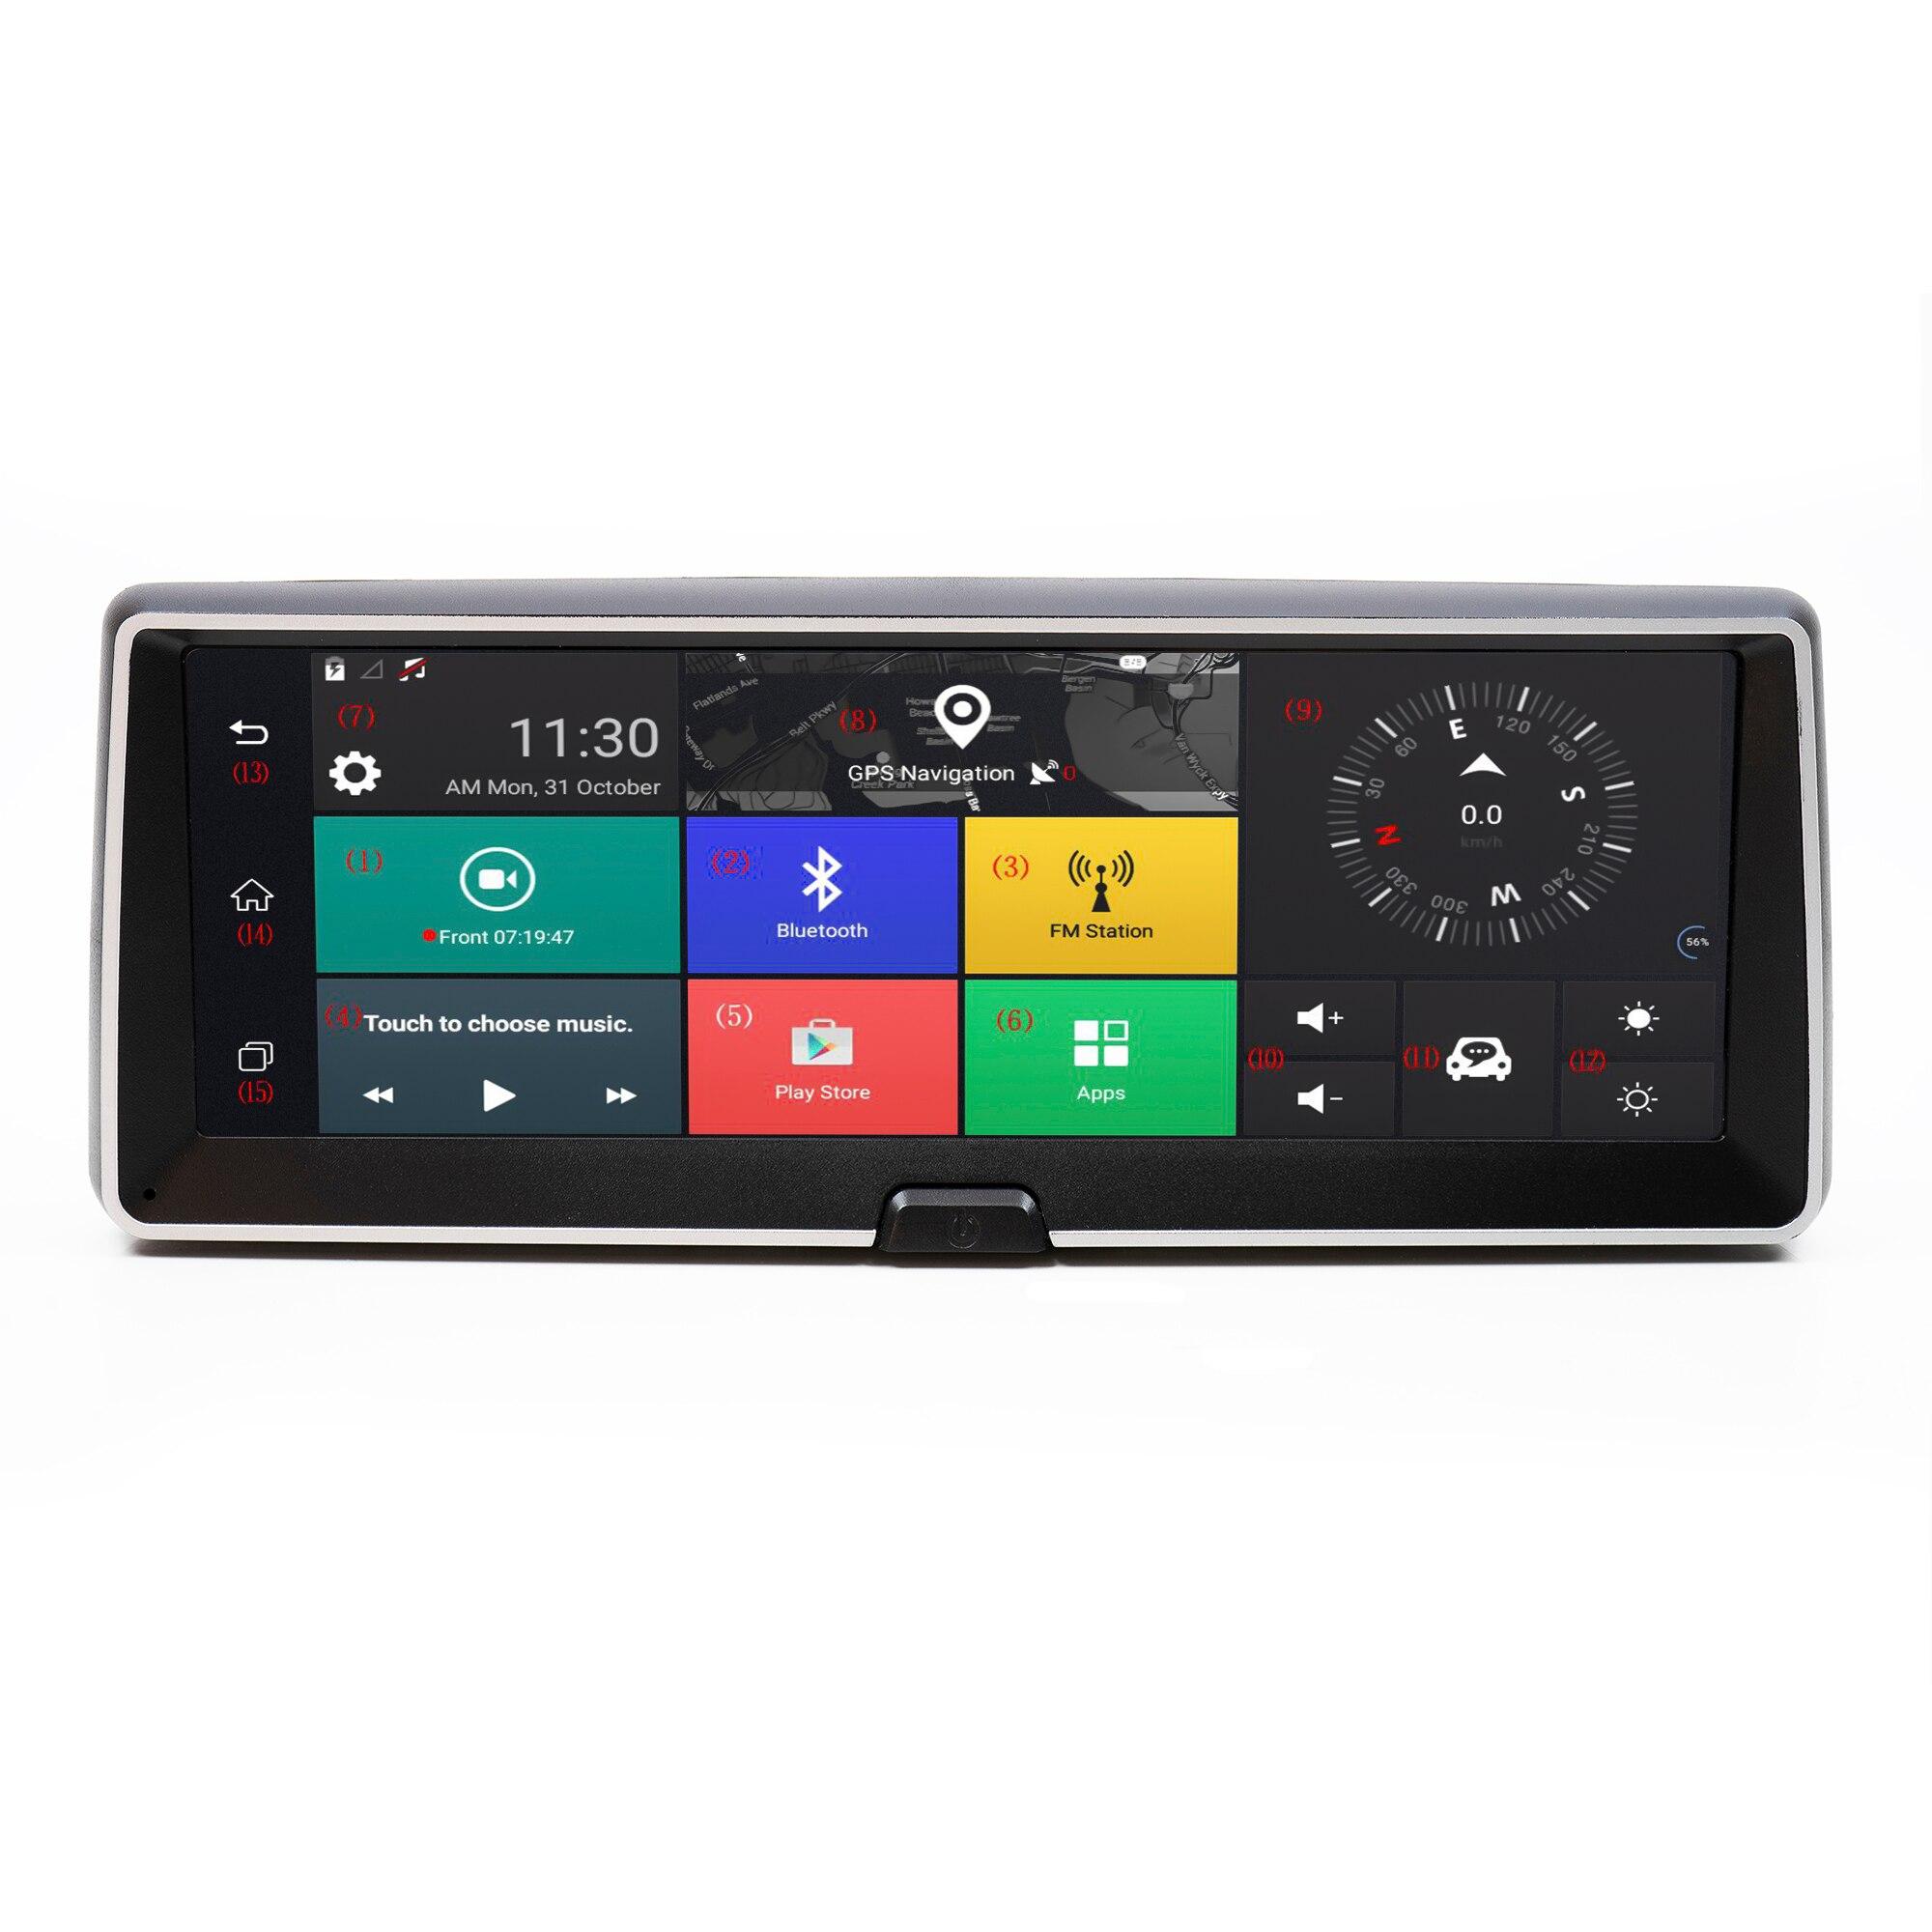 Fotografie Sistem de navigatie PNI DH706 cu GSM, 4G, Android si DVR auto, display 7 inch, smart GPS, 1 GB RAM, camera mers inapoi incluse